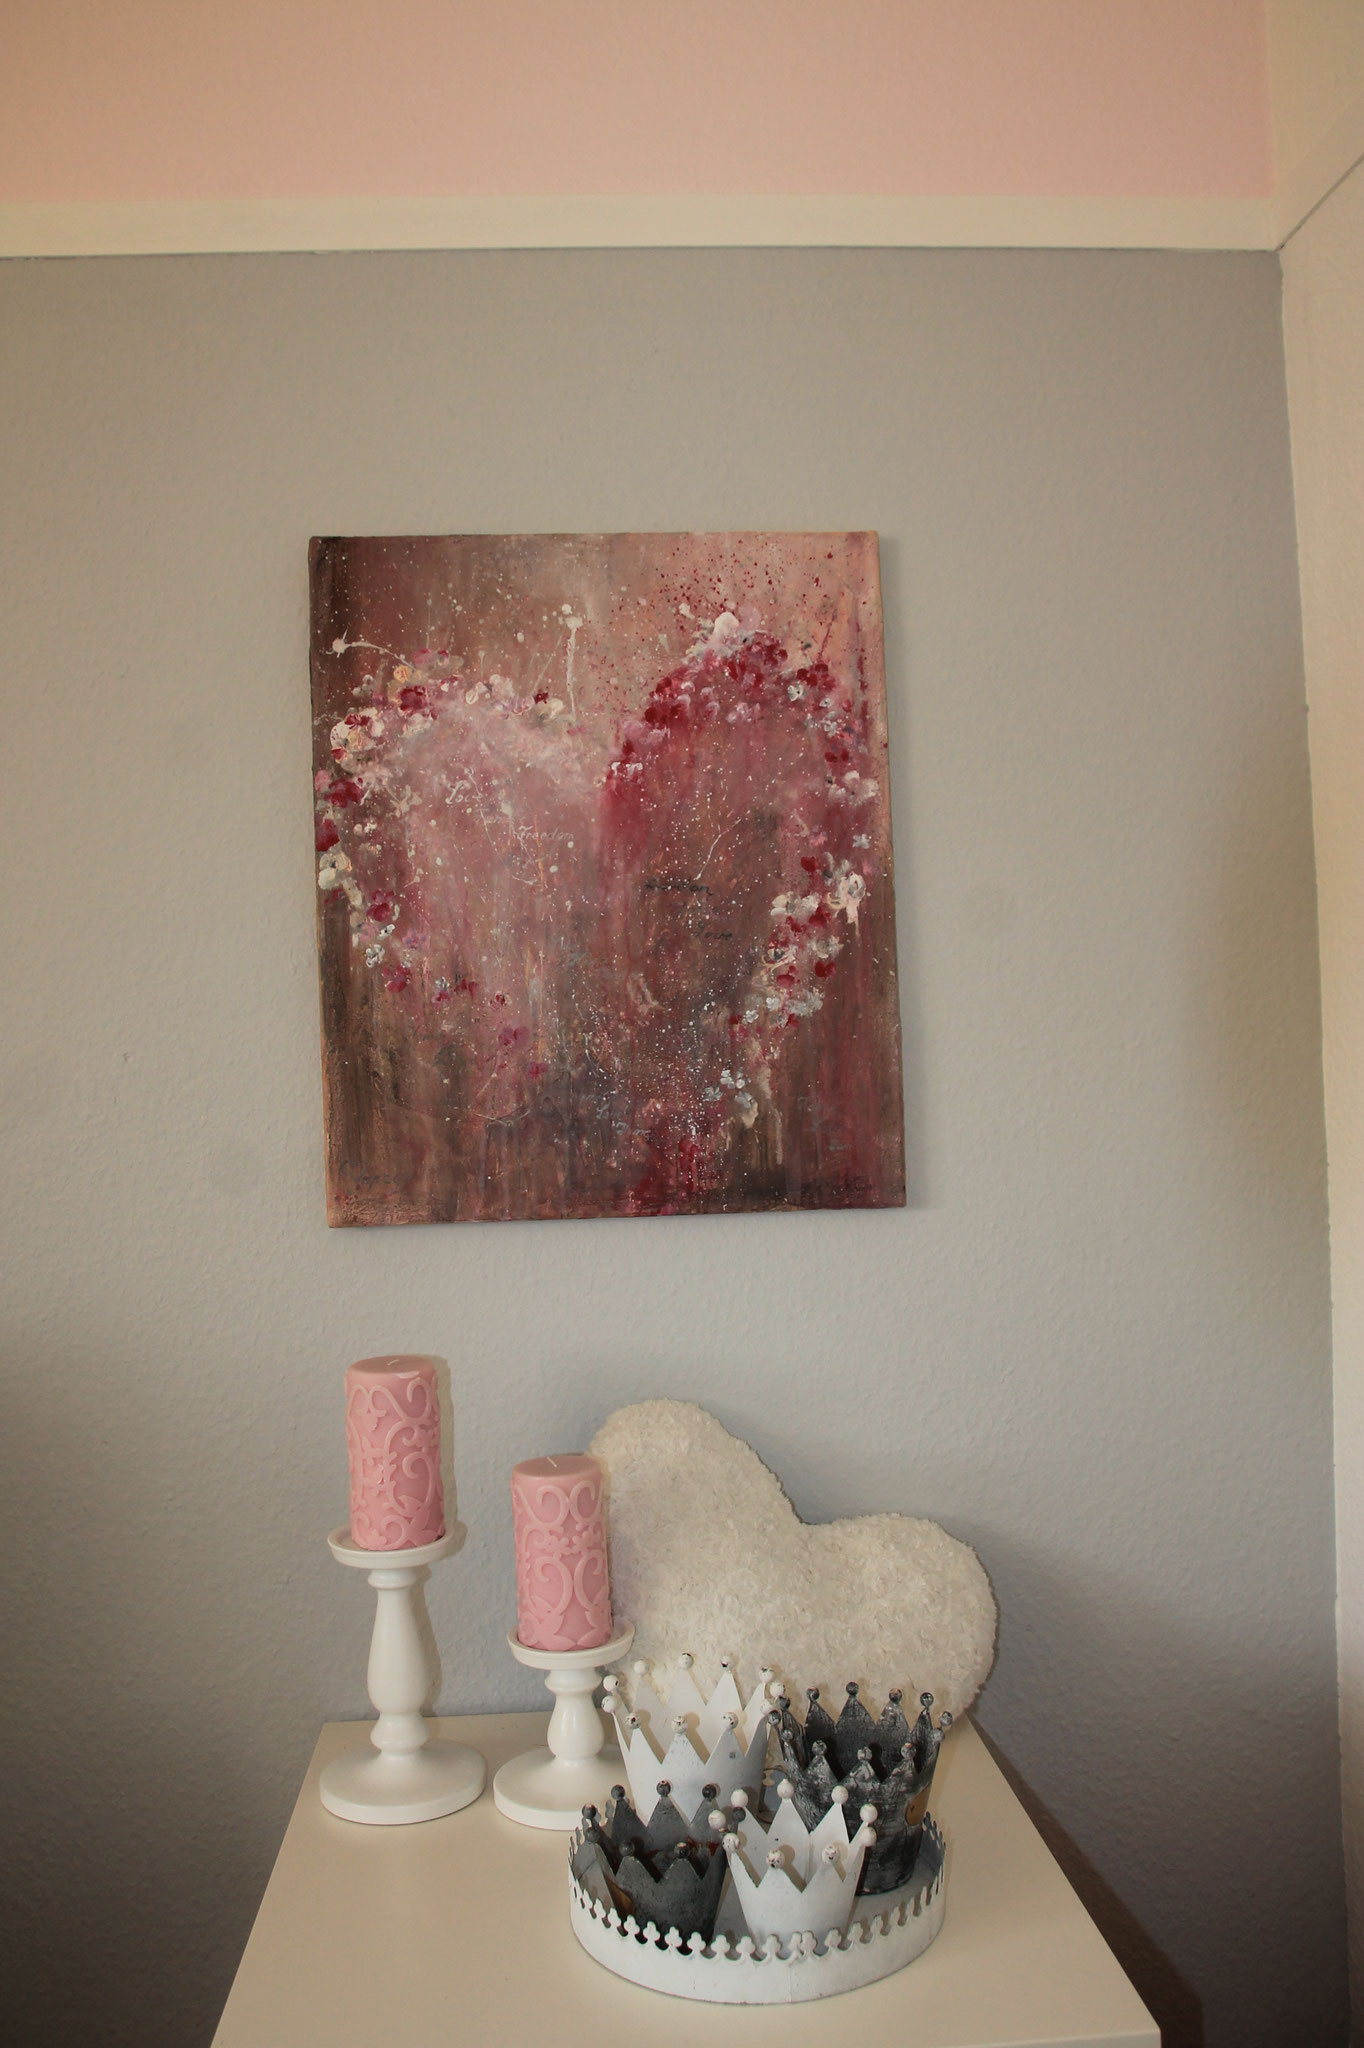 40 x 60 cm Acryl auf Leinwand